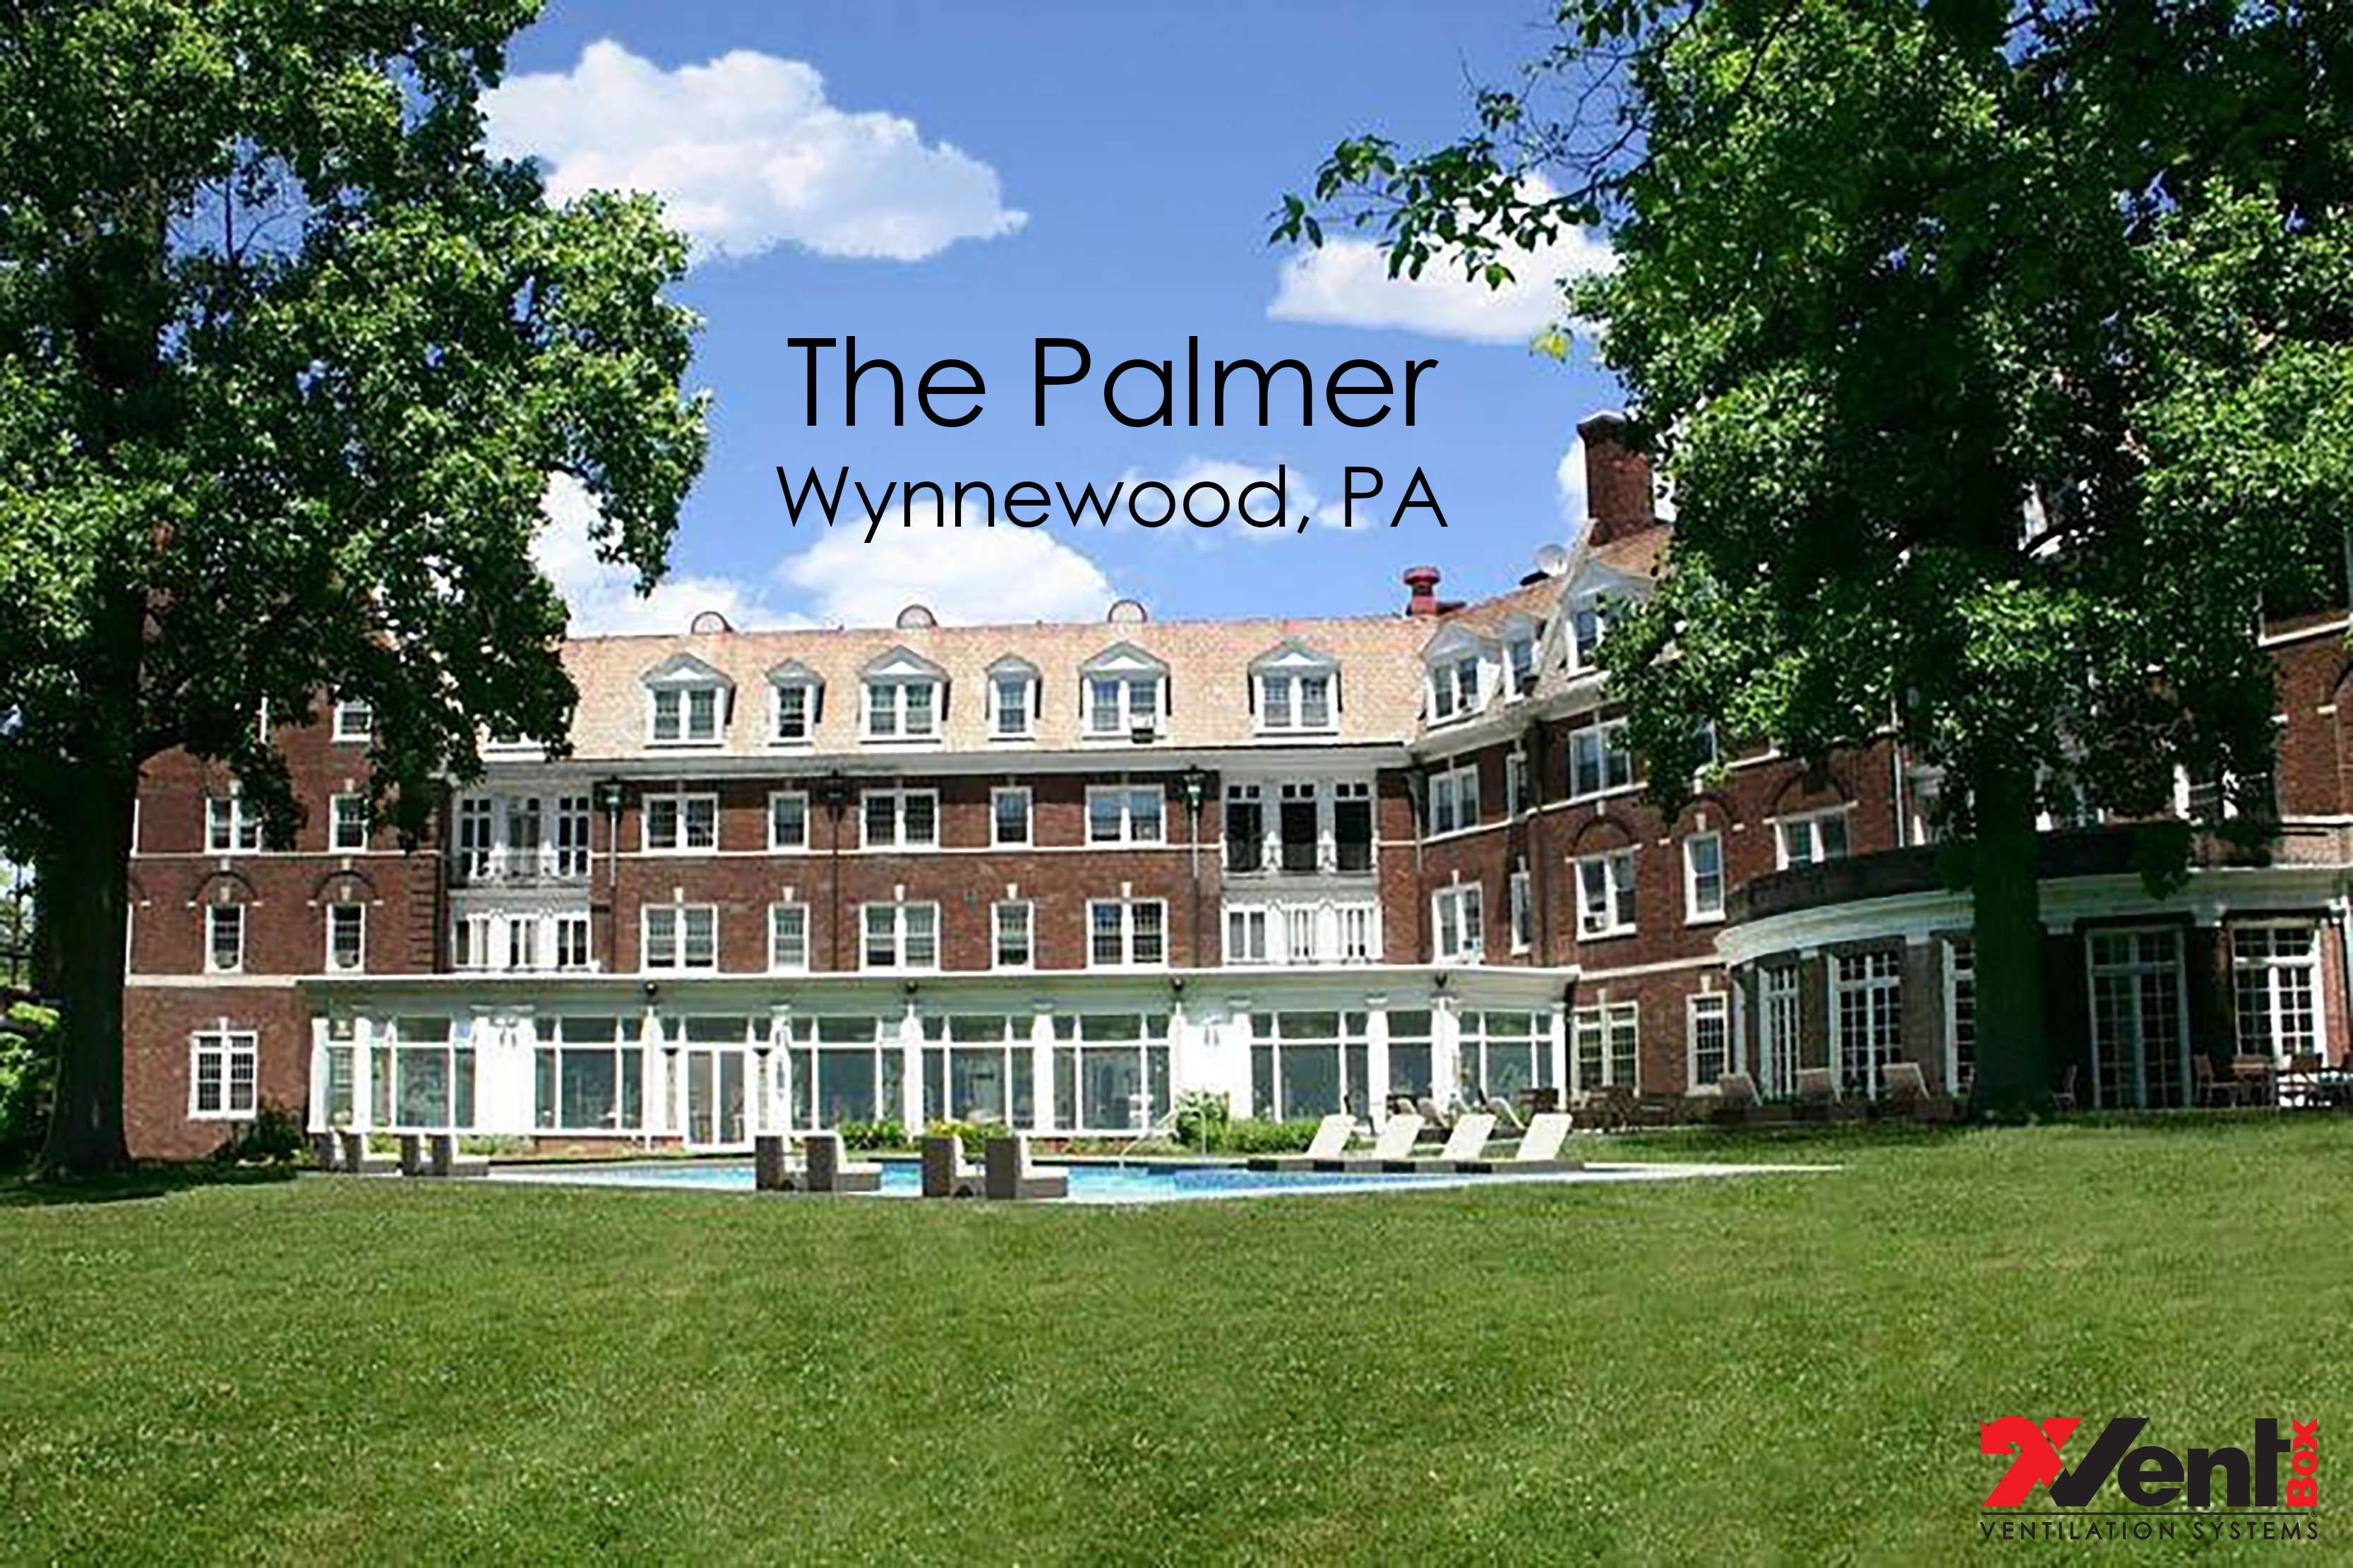 The Palmer